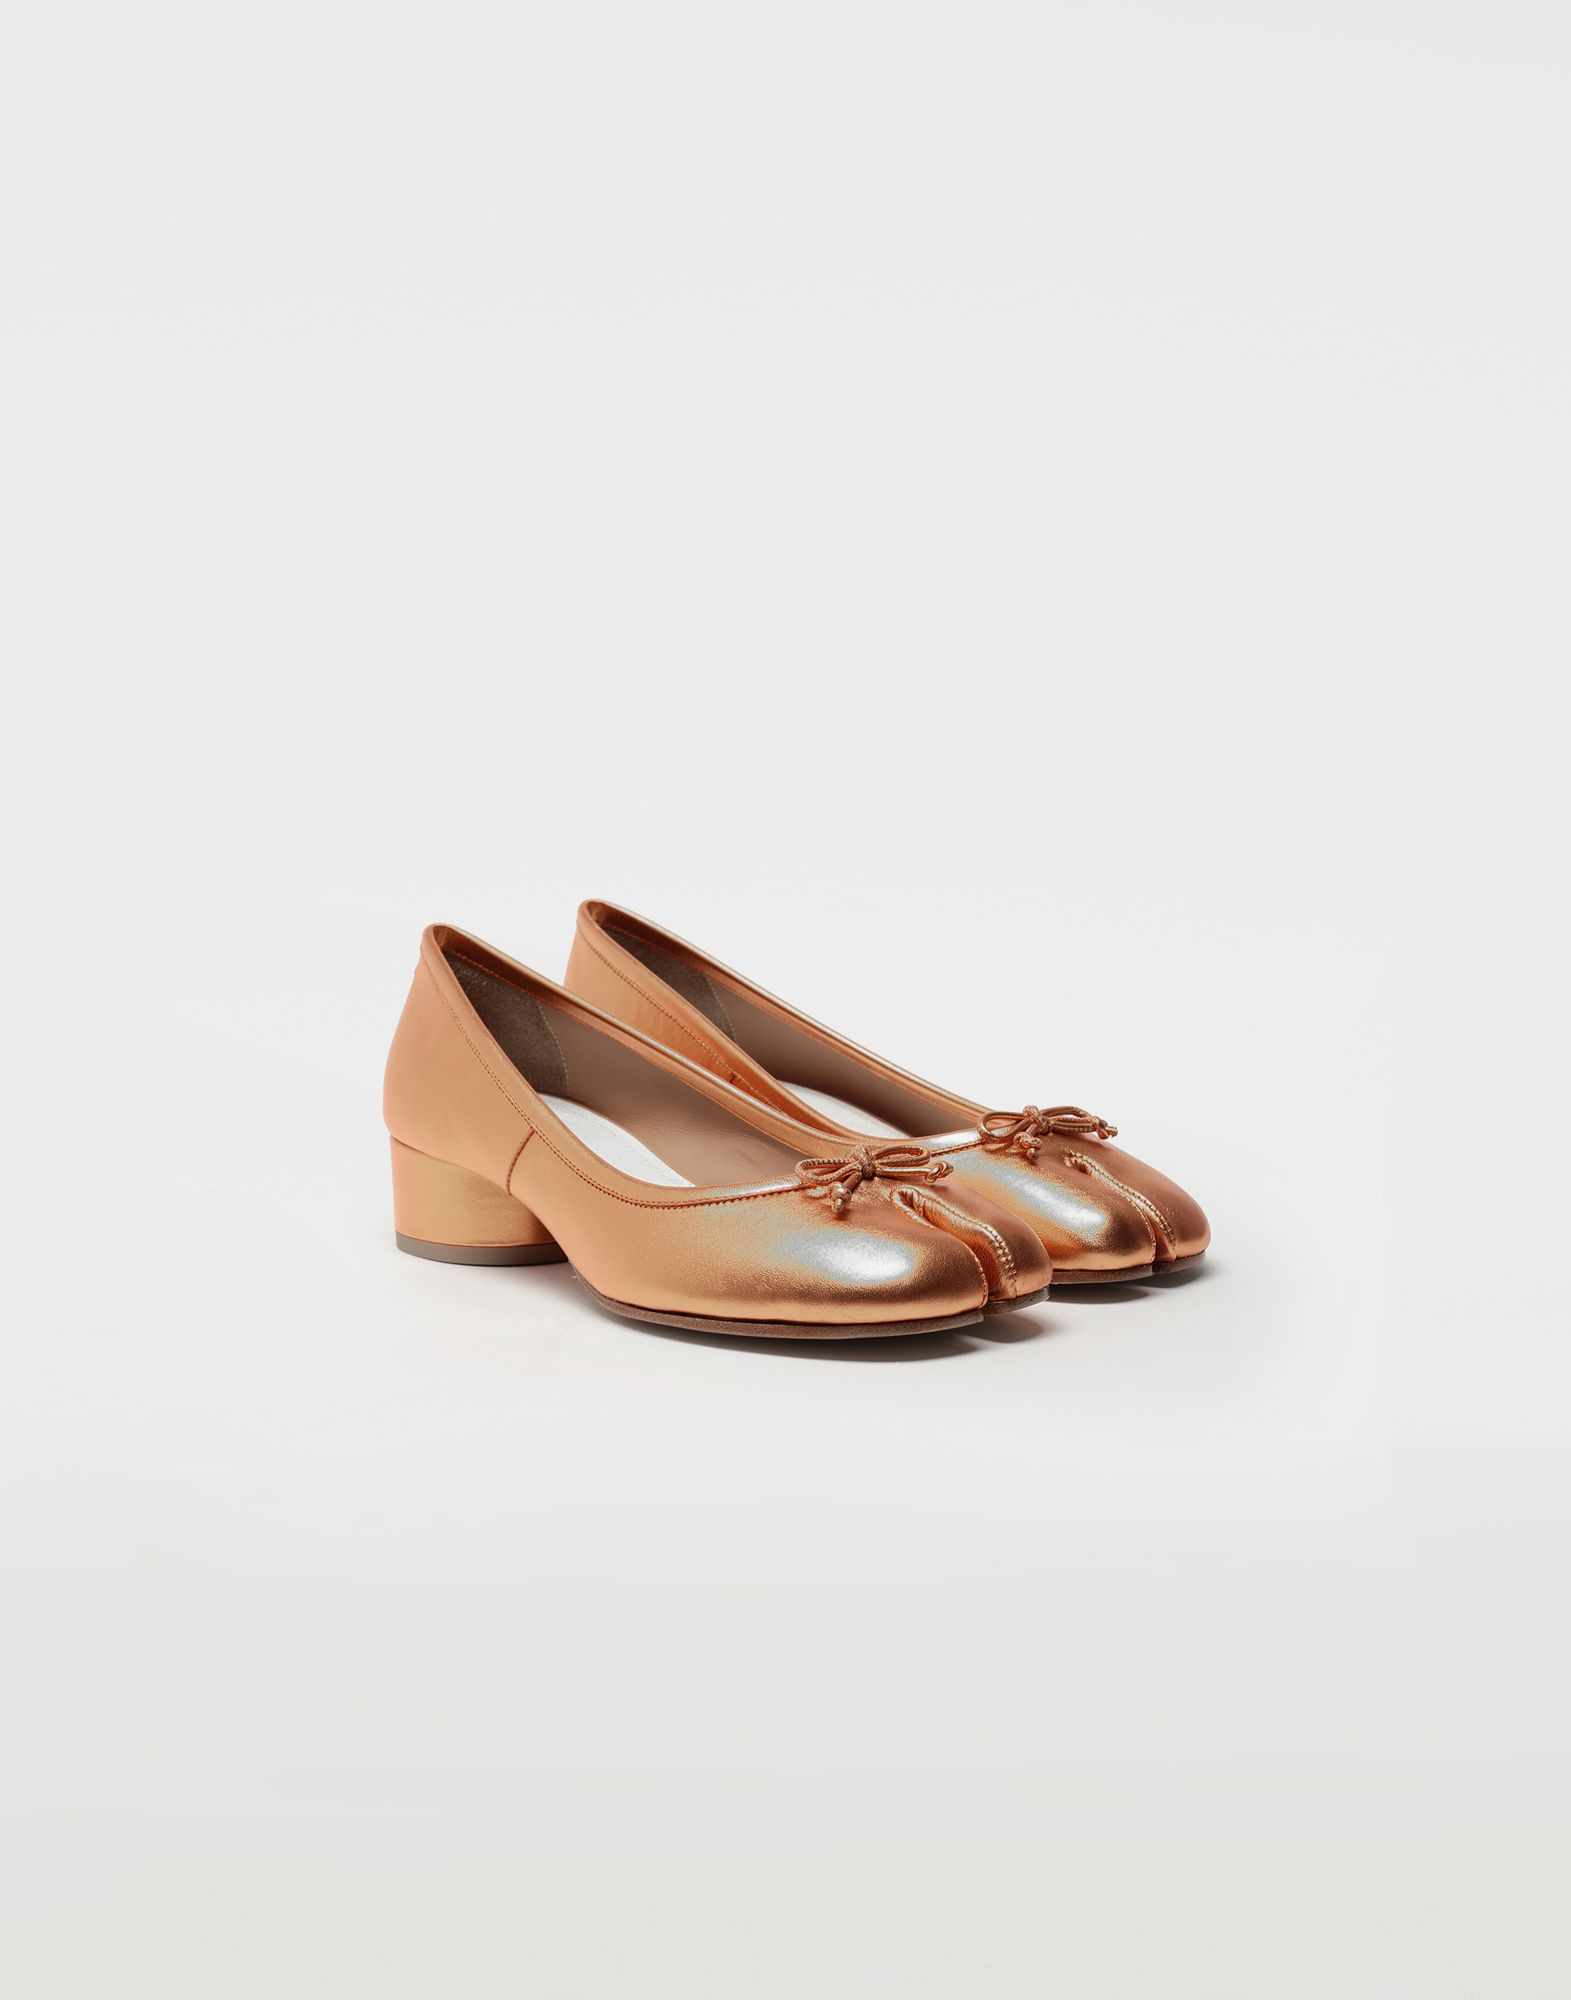 MAISON MARGIELA Tabi laminated leather ballerina pumps Ballet flats Woman r